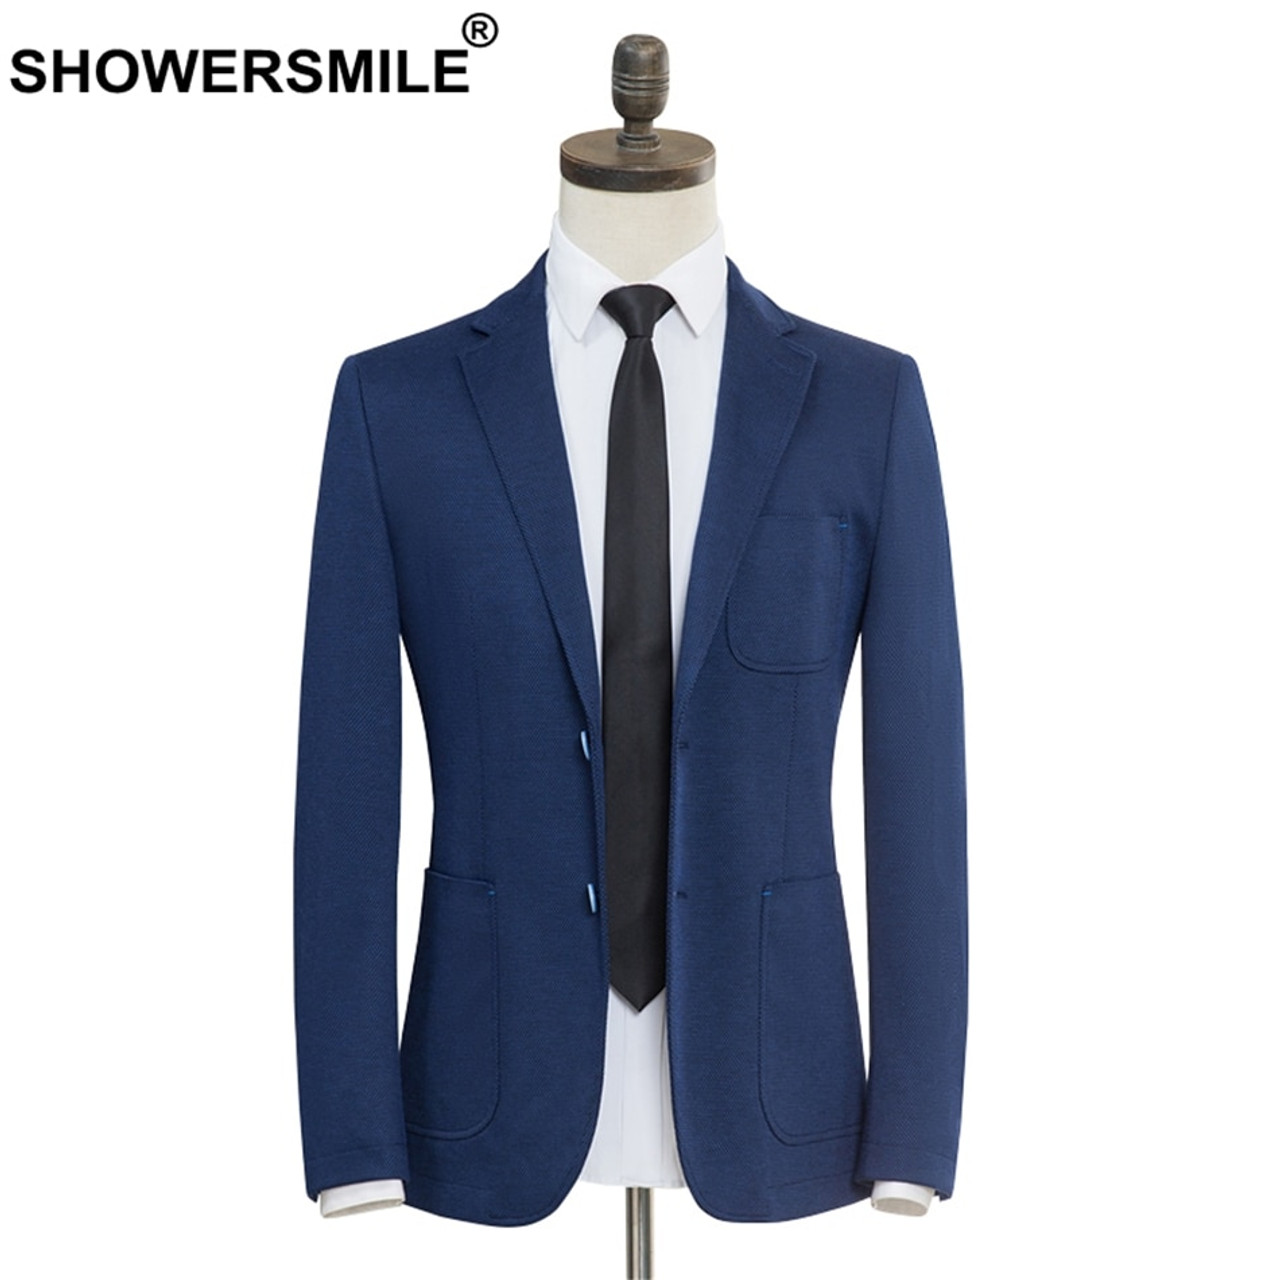 Showersmile Brand Smart Casual Blazer Men Slim Fit Blue Suit Jacket